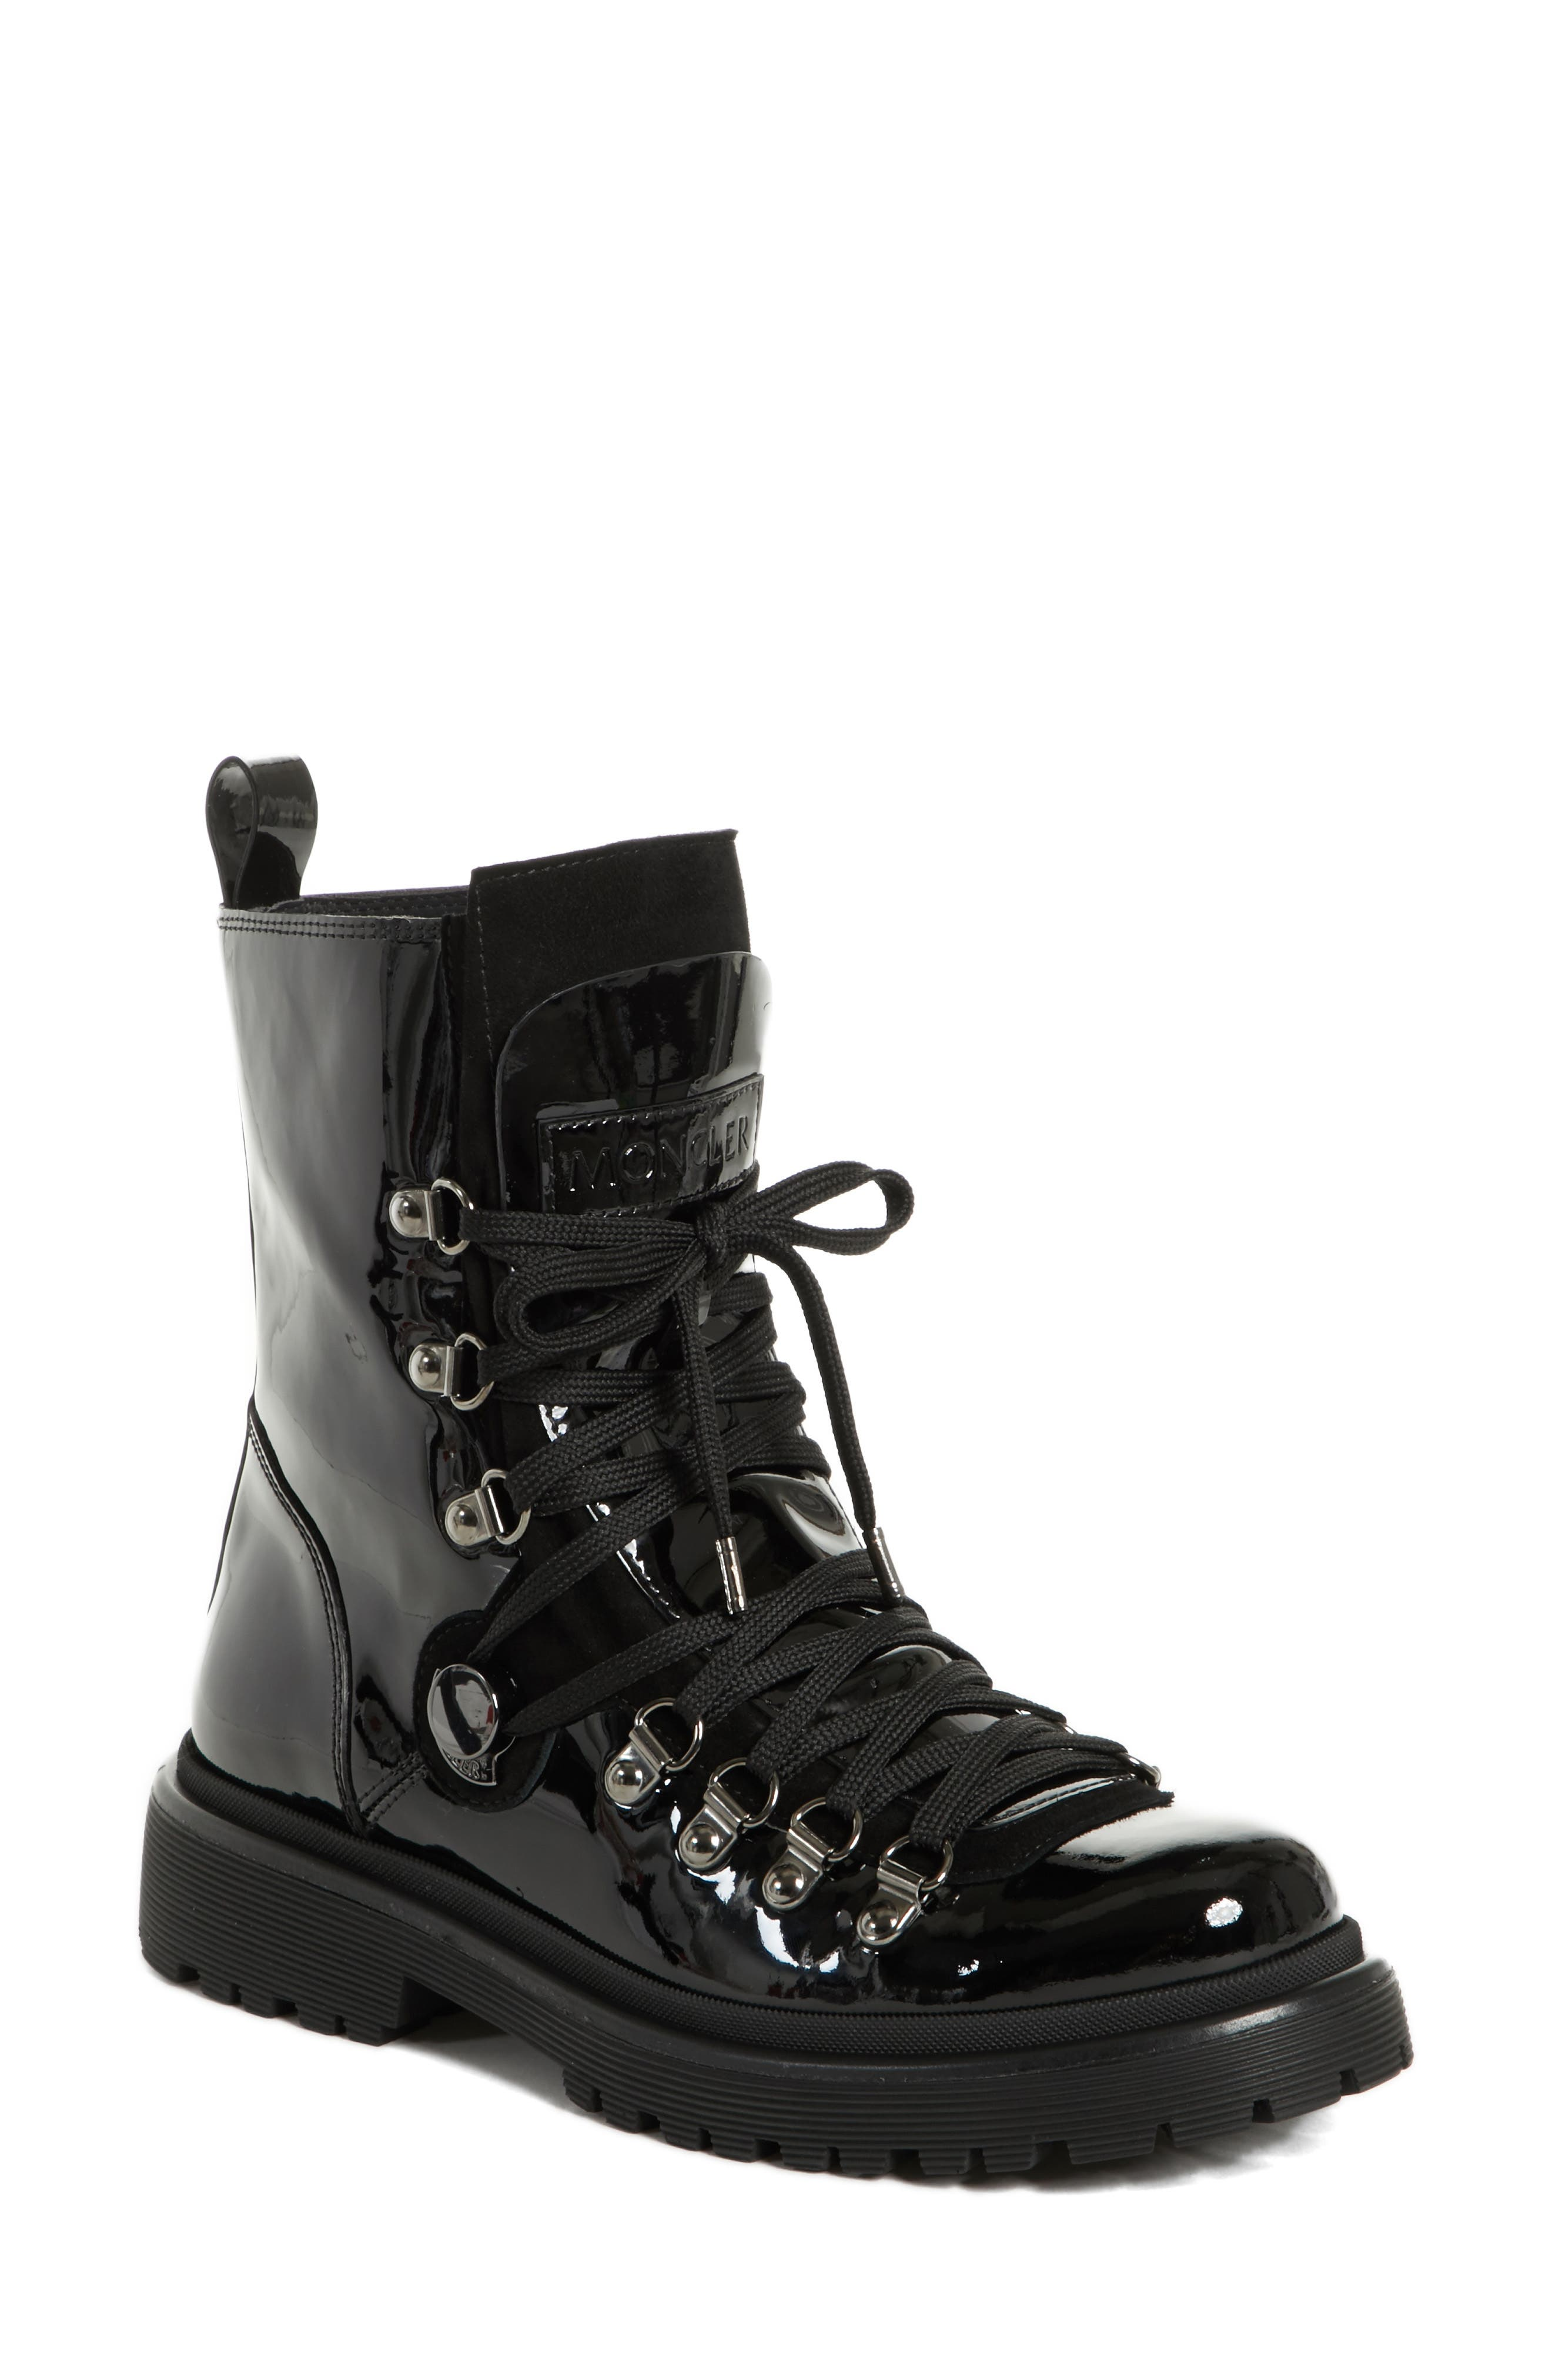 MONCLER,                             Berenice Stivale Lace-Up Boot,                             Main thumbnail 1, color,                             BLACK PATENT